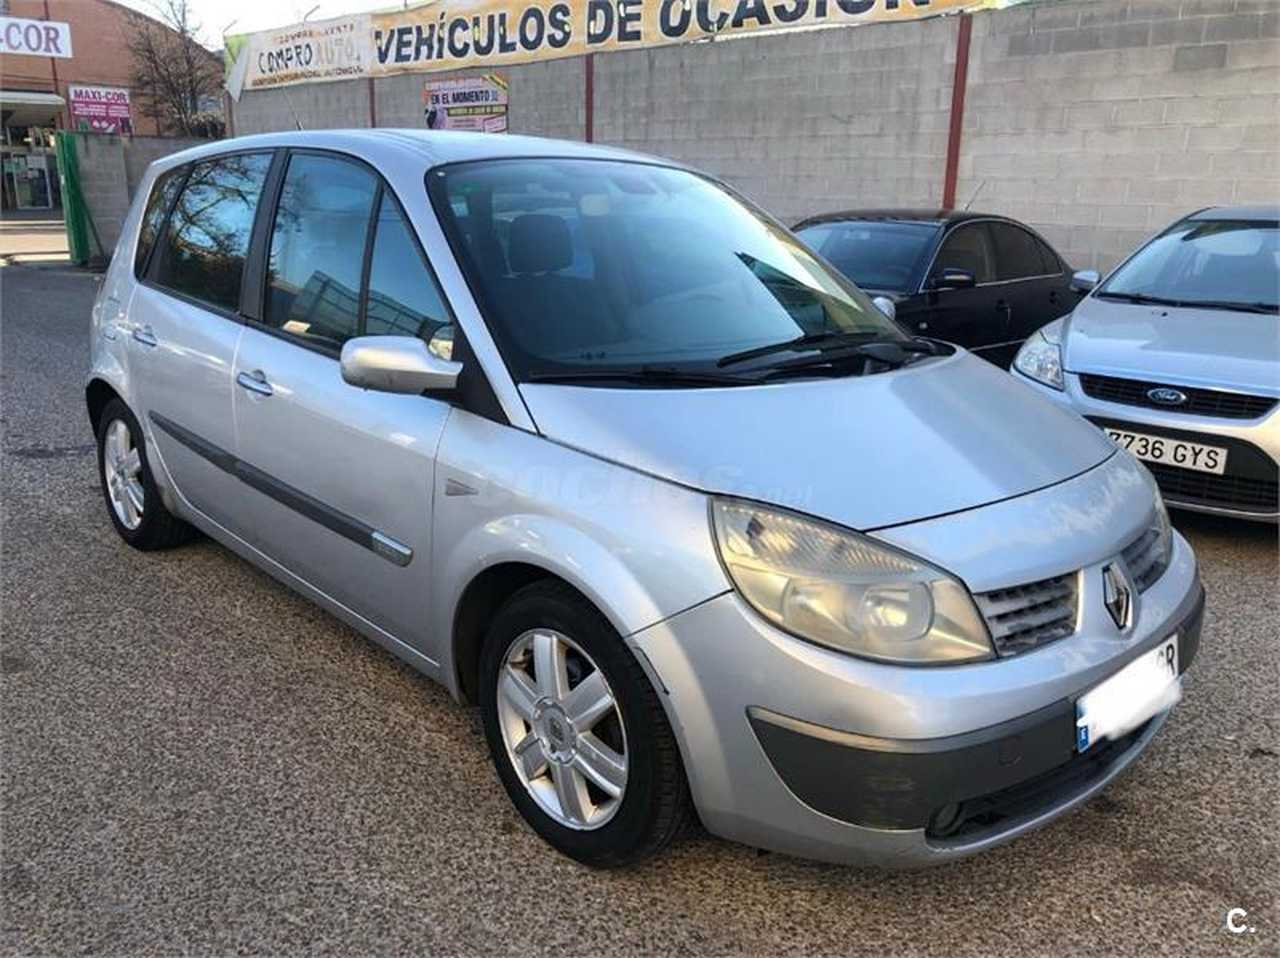 Renault Scénic 1.9 dci Confort 120cv   - Foto 1